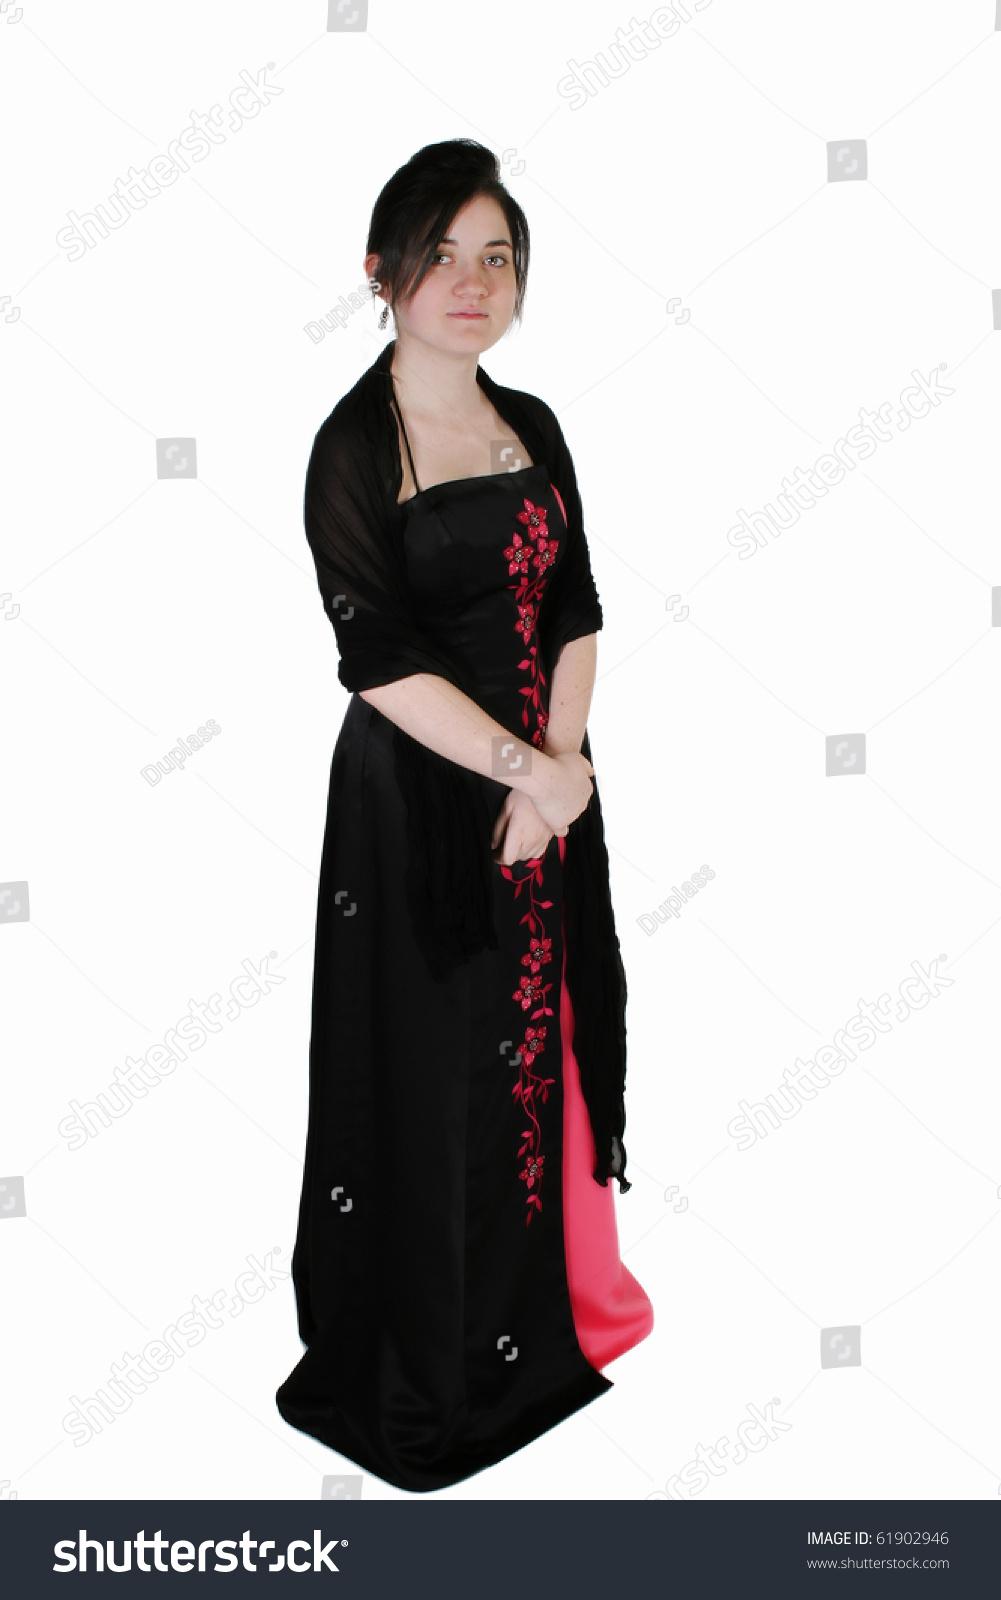 Beautiful 15 Year Old Girl Formal Stock Photo 61902946